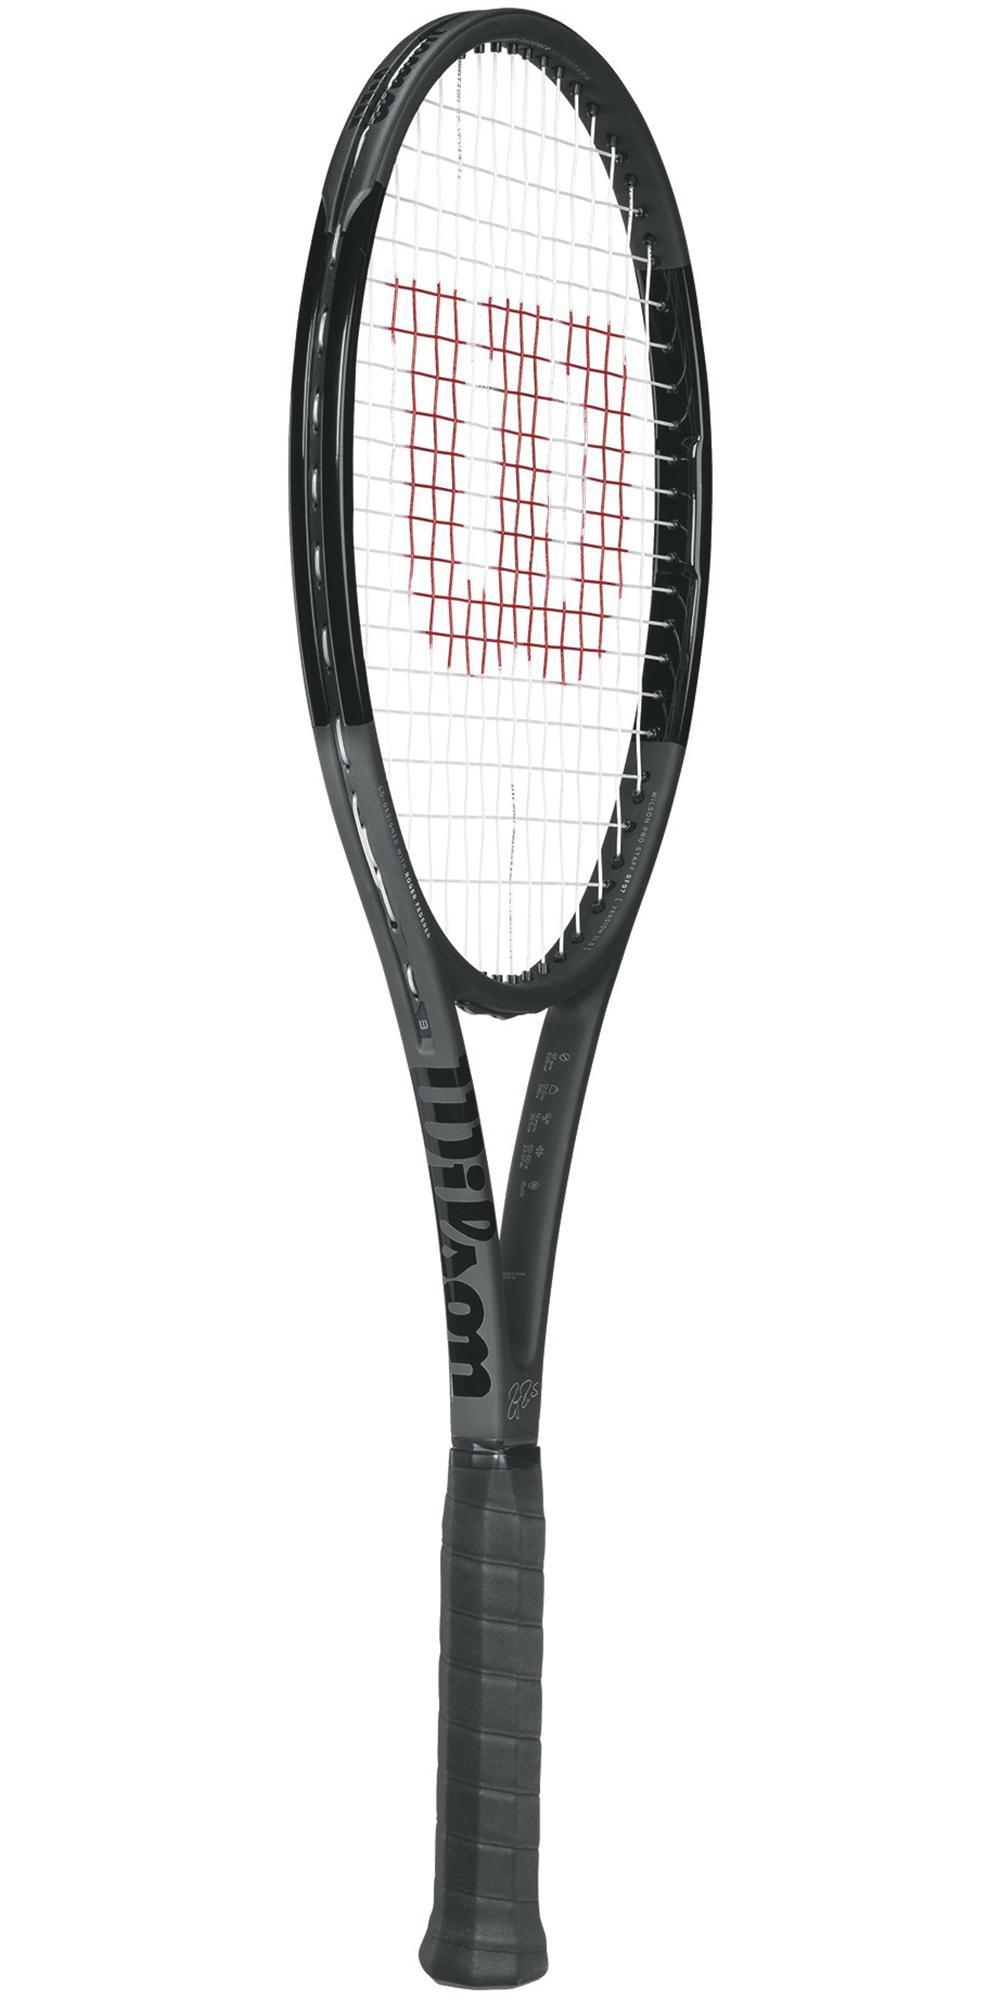 0e8934ea4 Wilson Pro Staff RF97 Autograph Tennis Racket (2017)  Frame Only ...